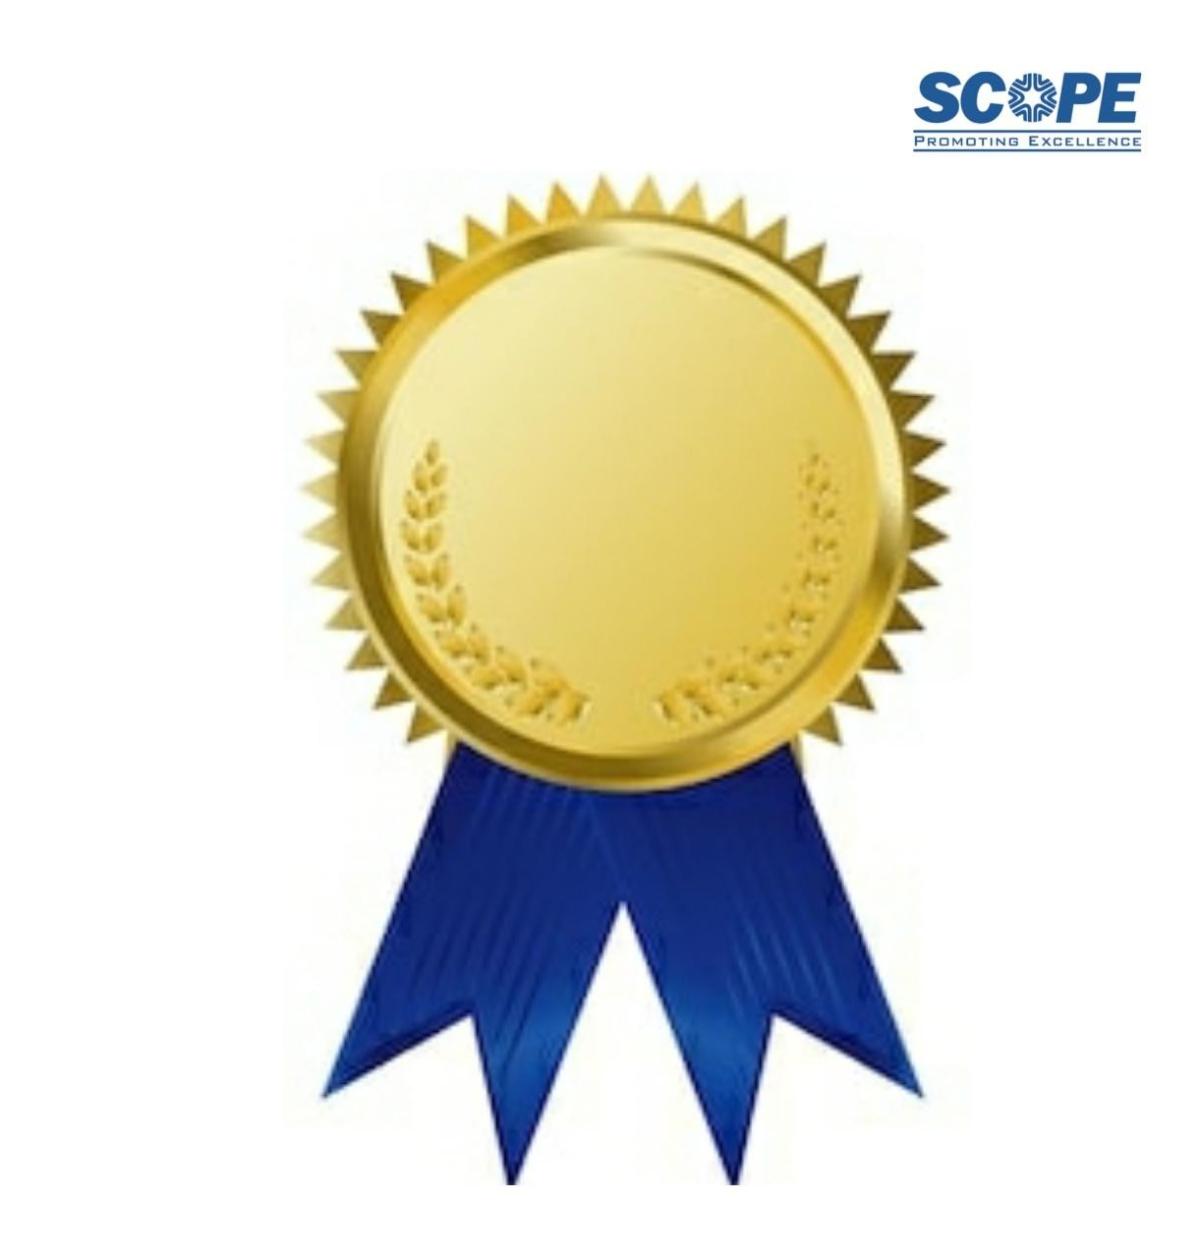 SCOPE Eminence Awards 2019-20 launched